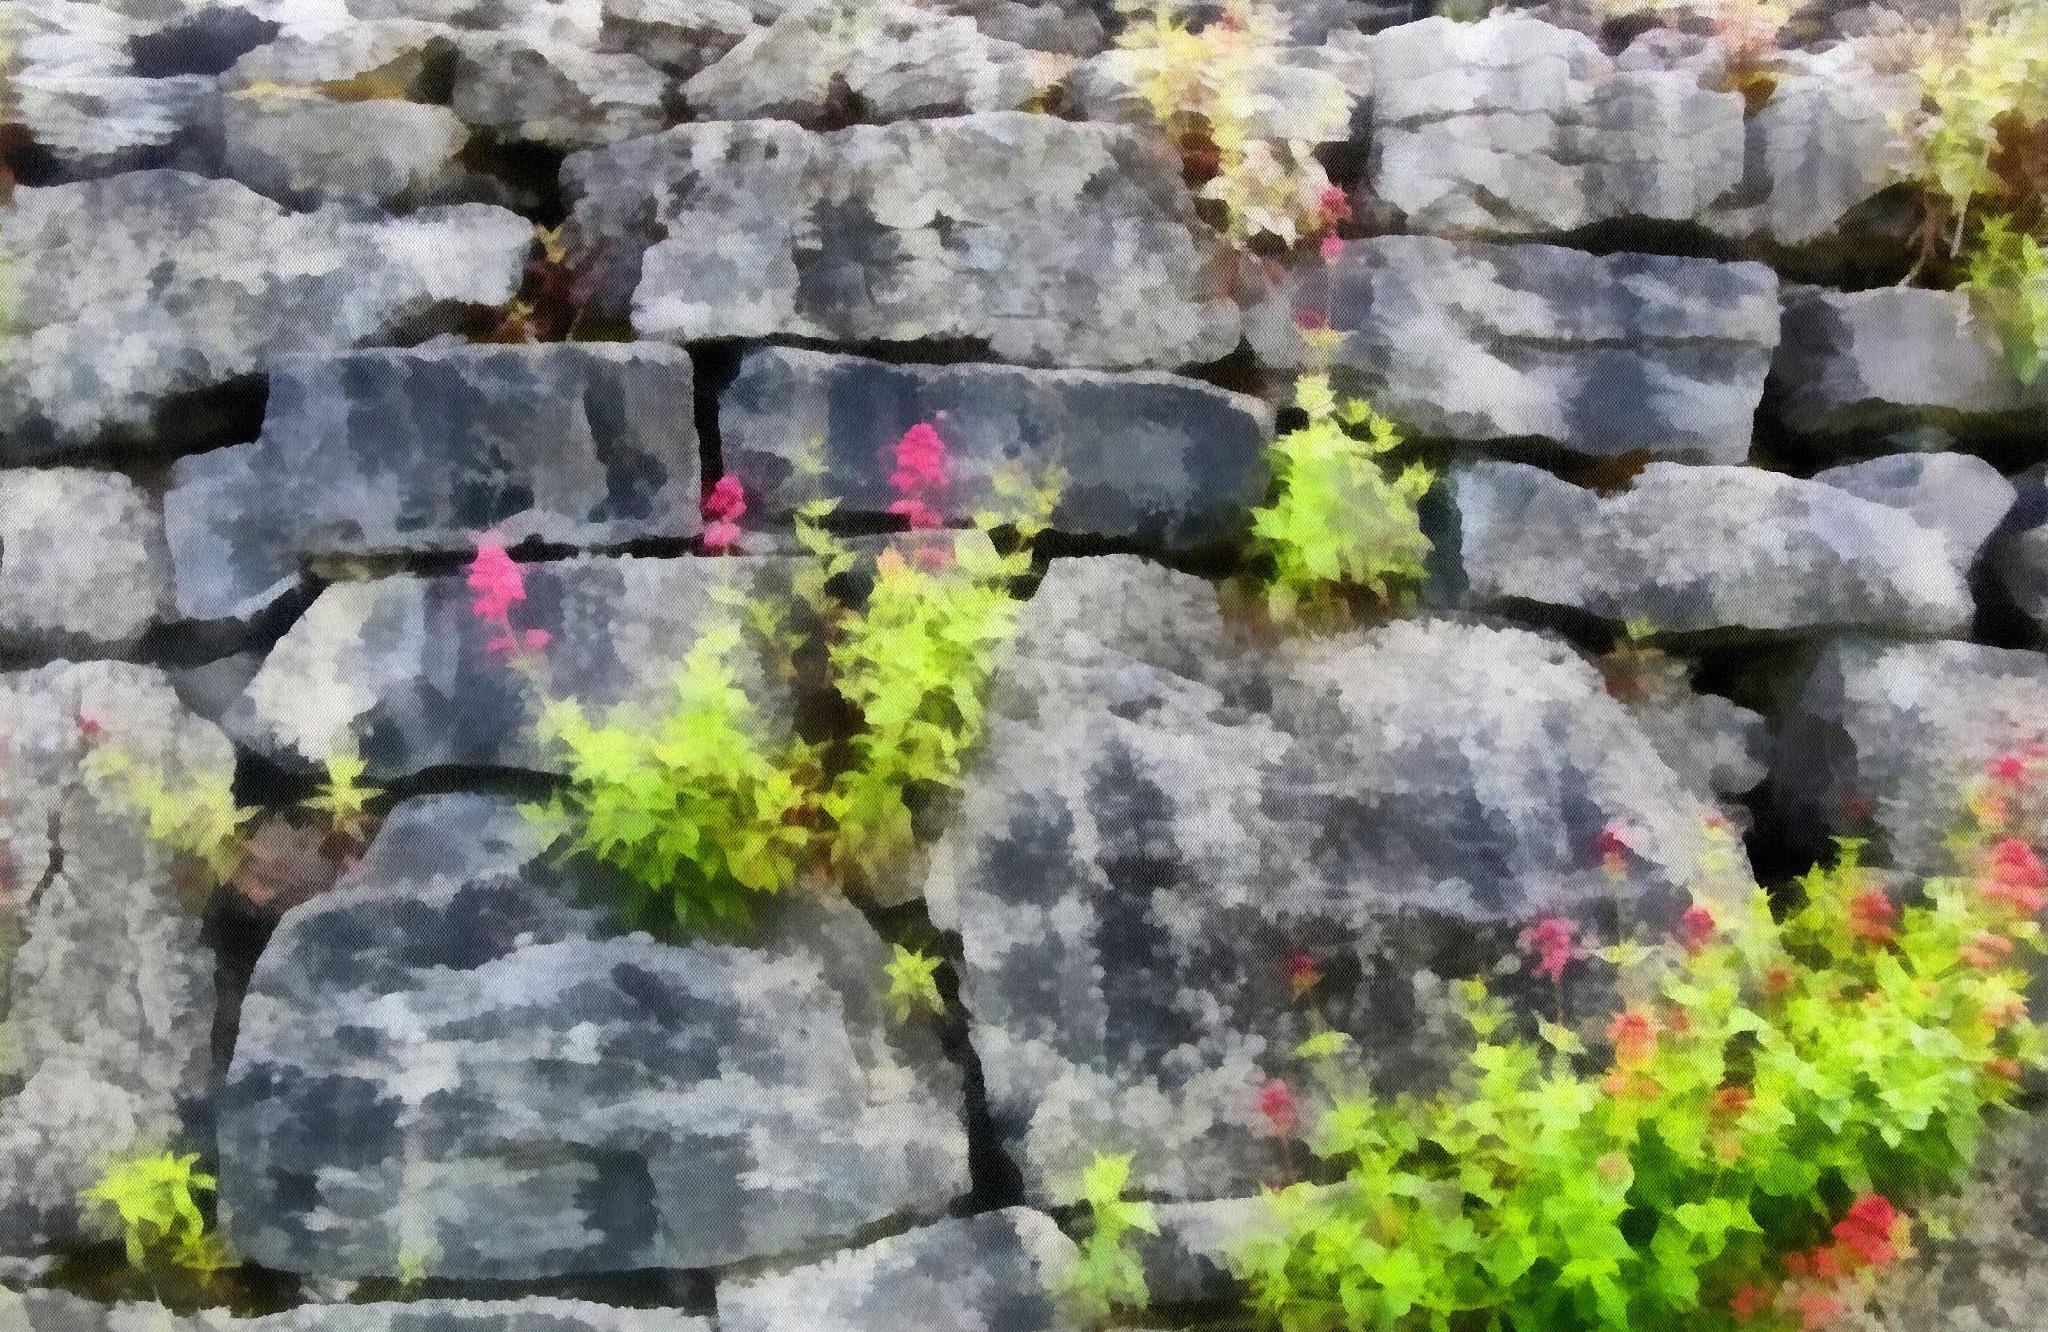 Stone wall in County Clare, Ireland by Terry Ballard